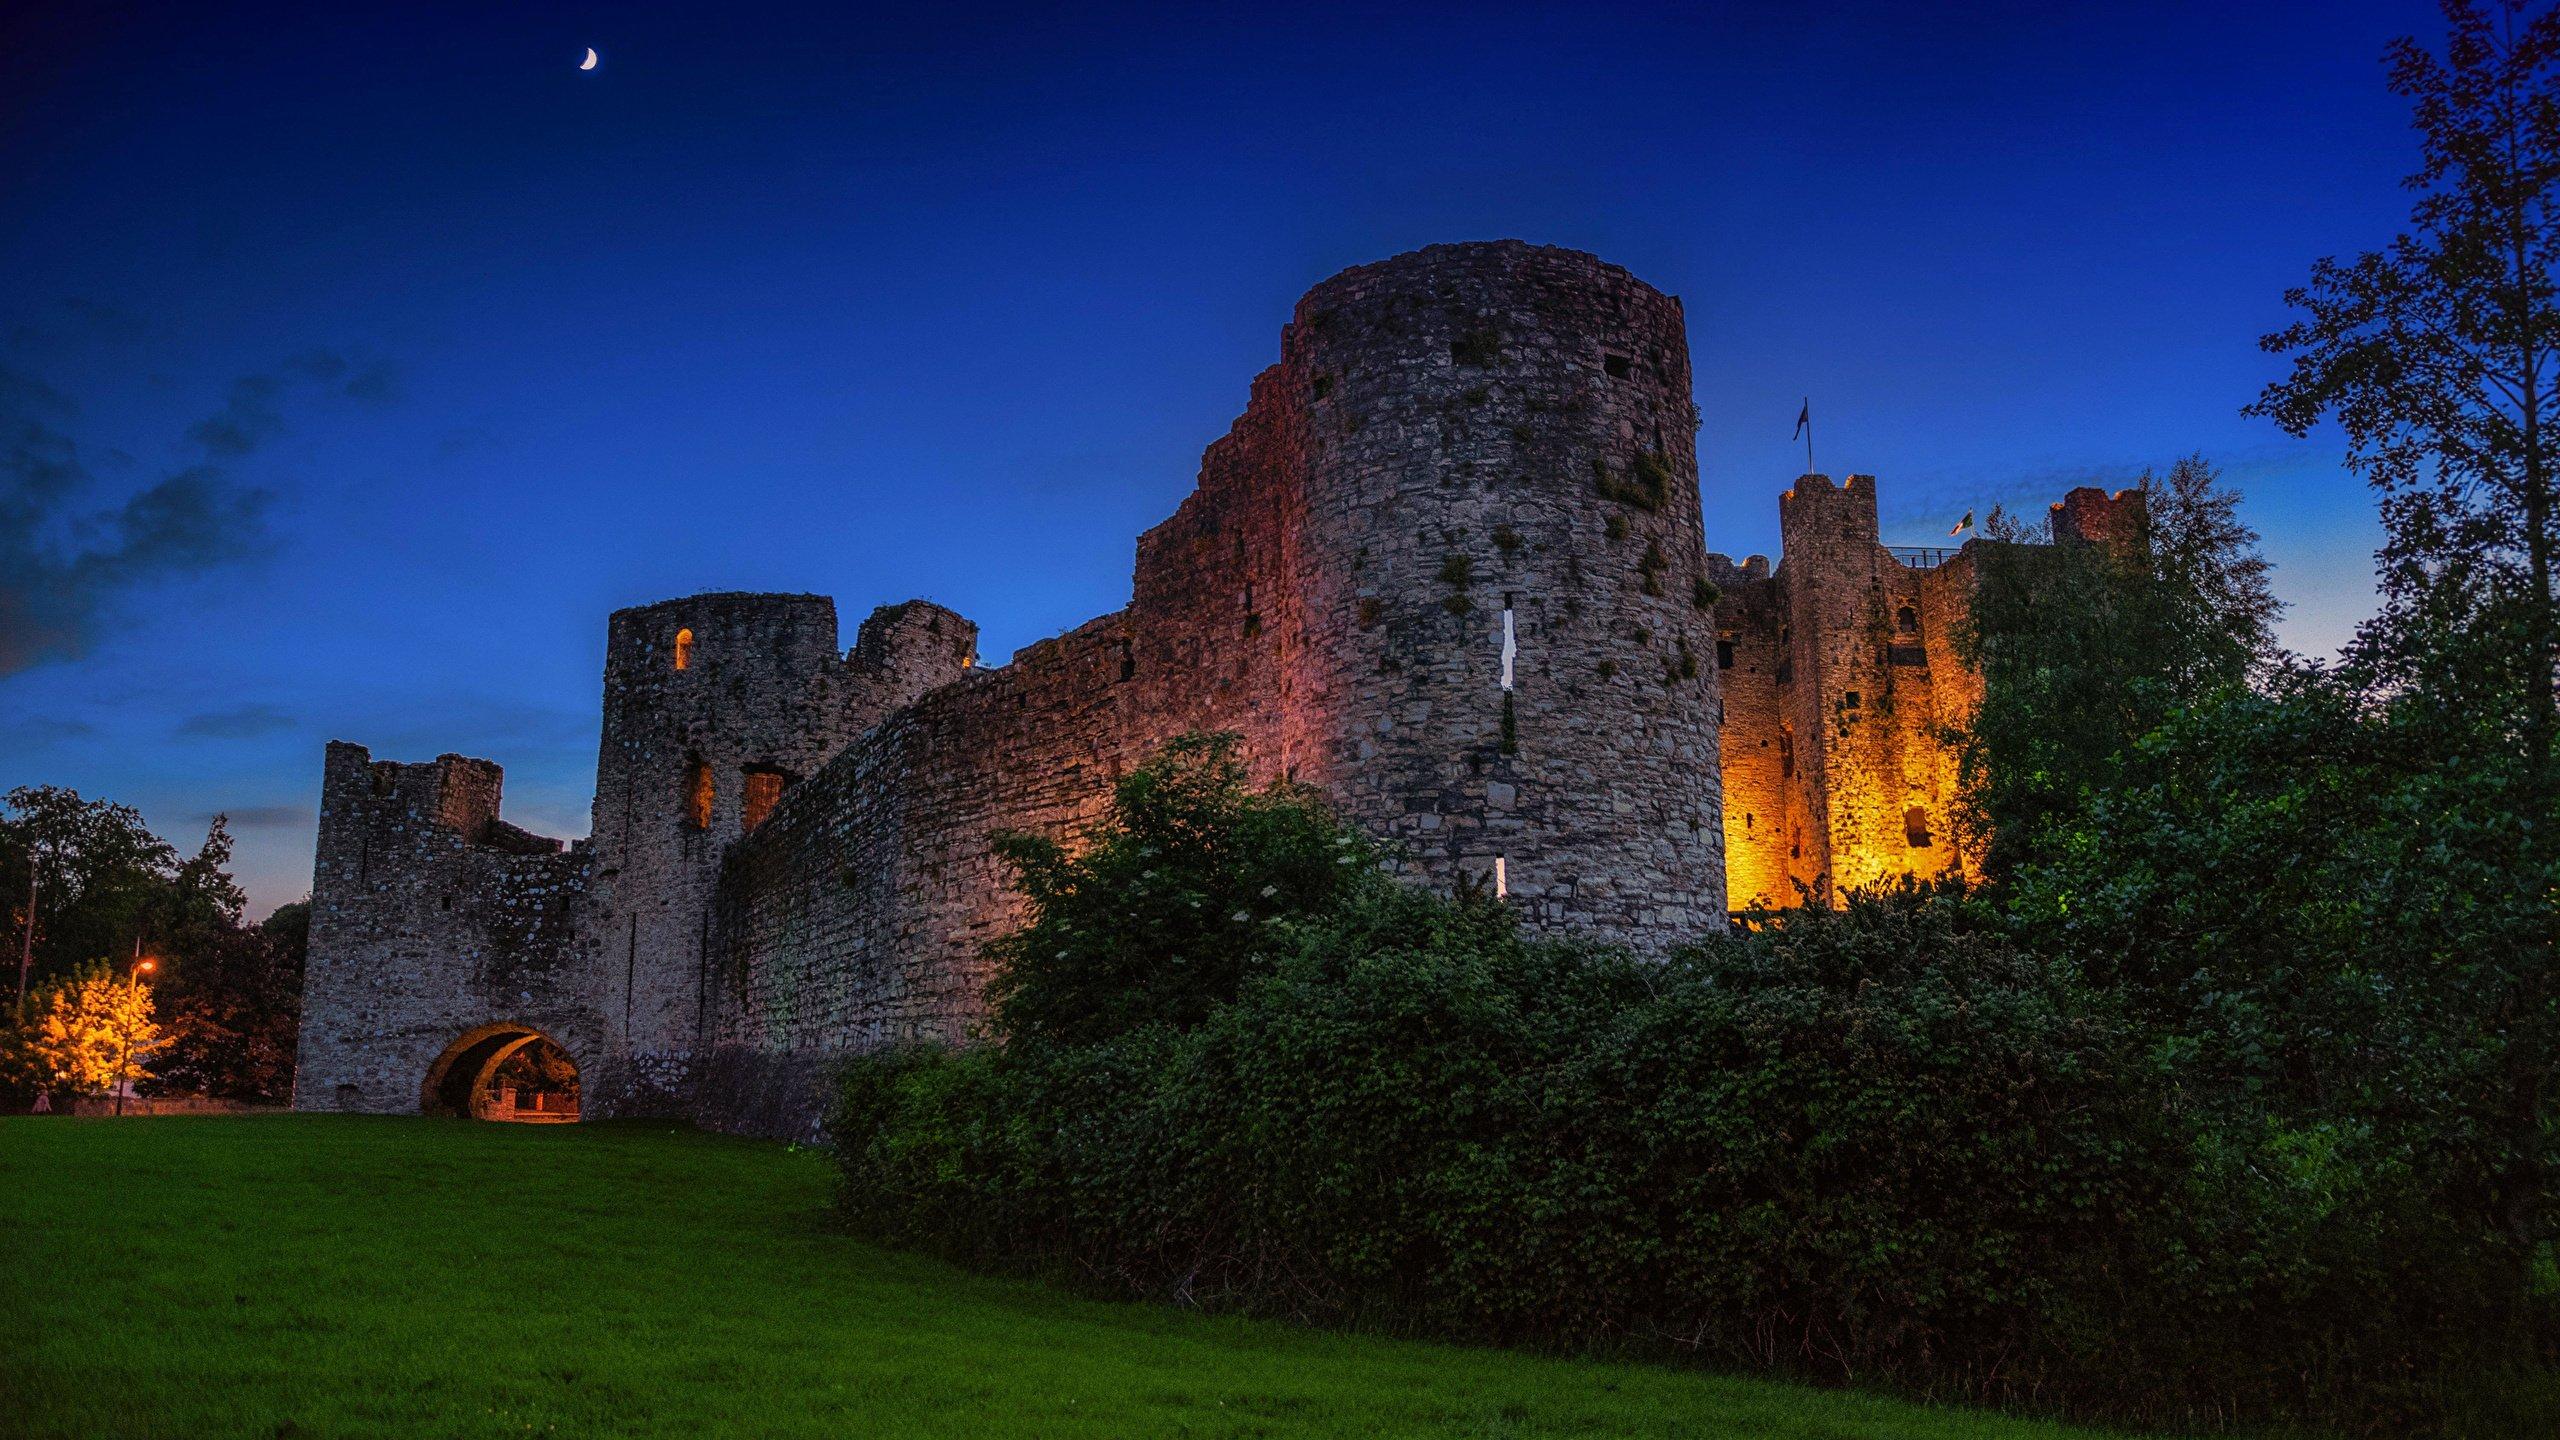 Trim Castle Ireland Hd Wallpaper HD Wallpapers Download Free Images Wallpaper [1000image.com]